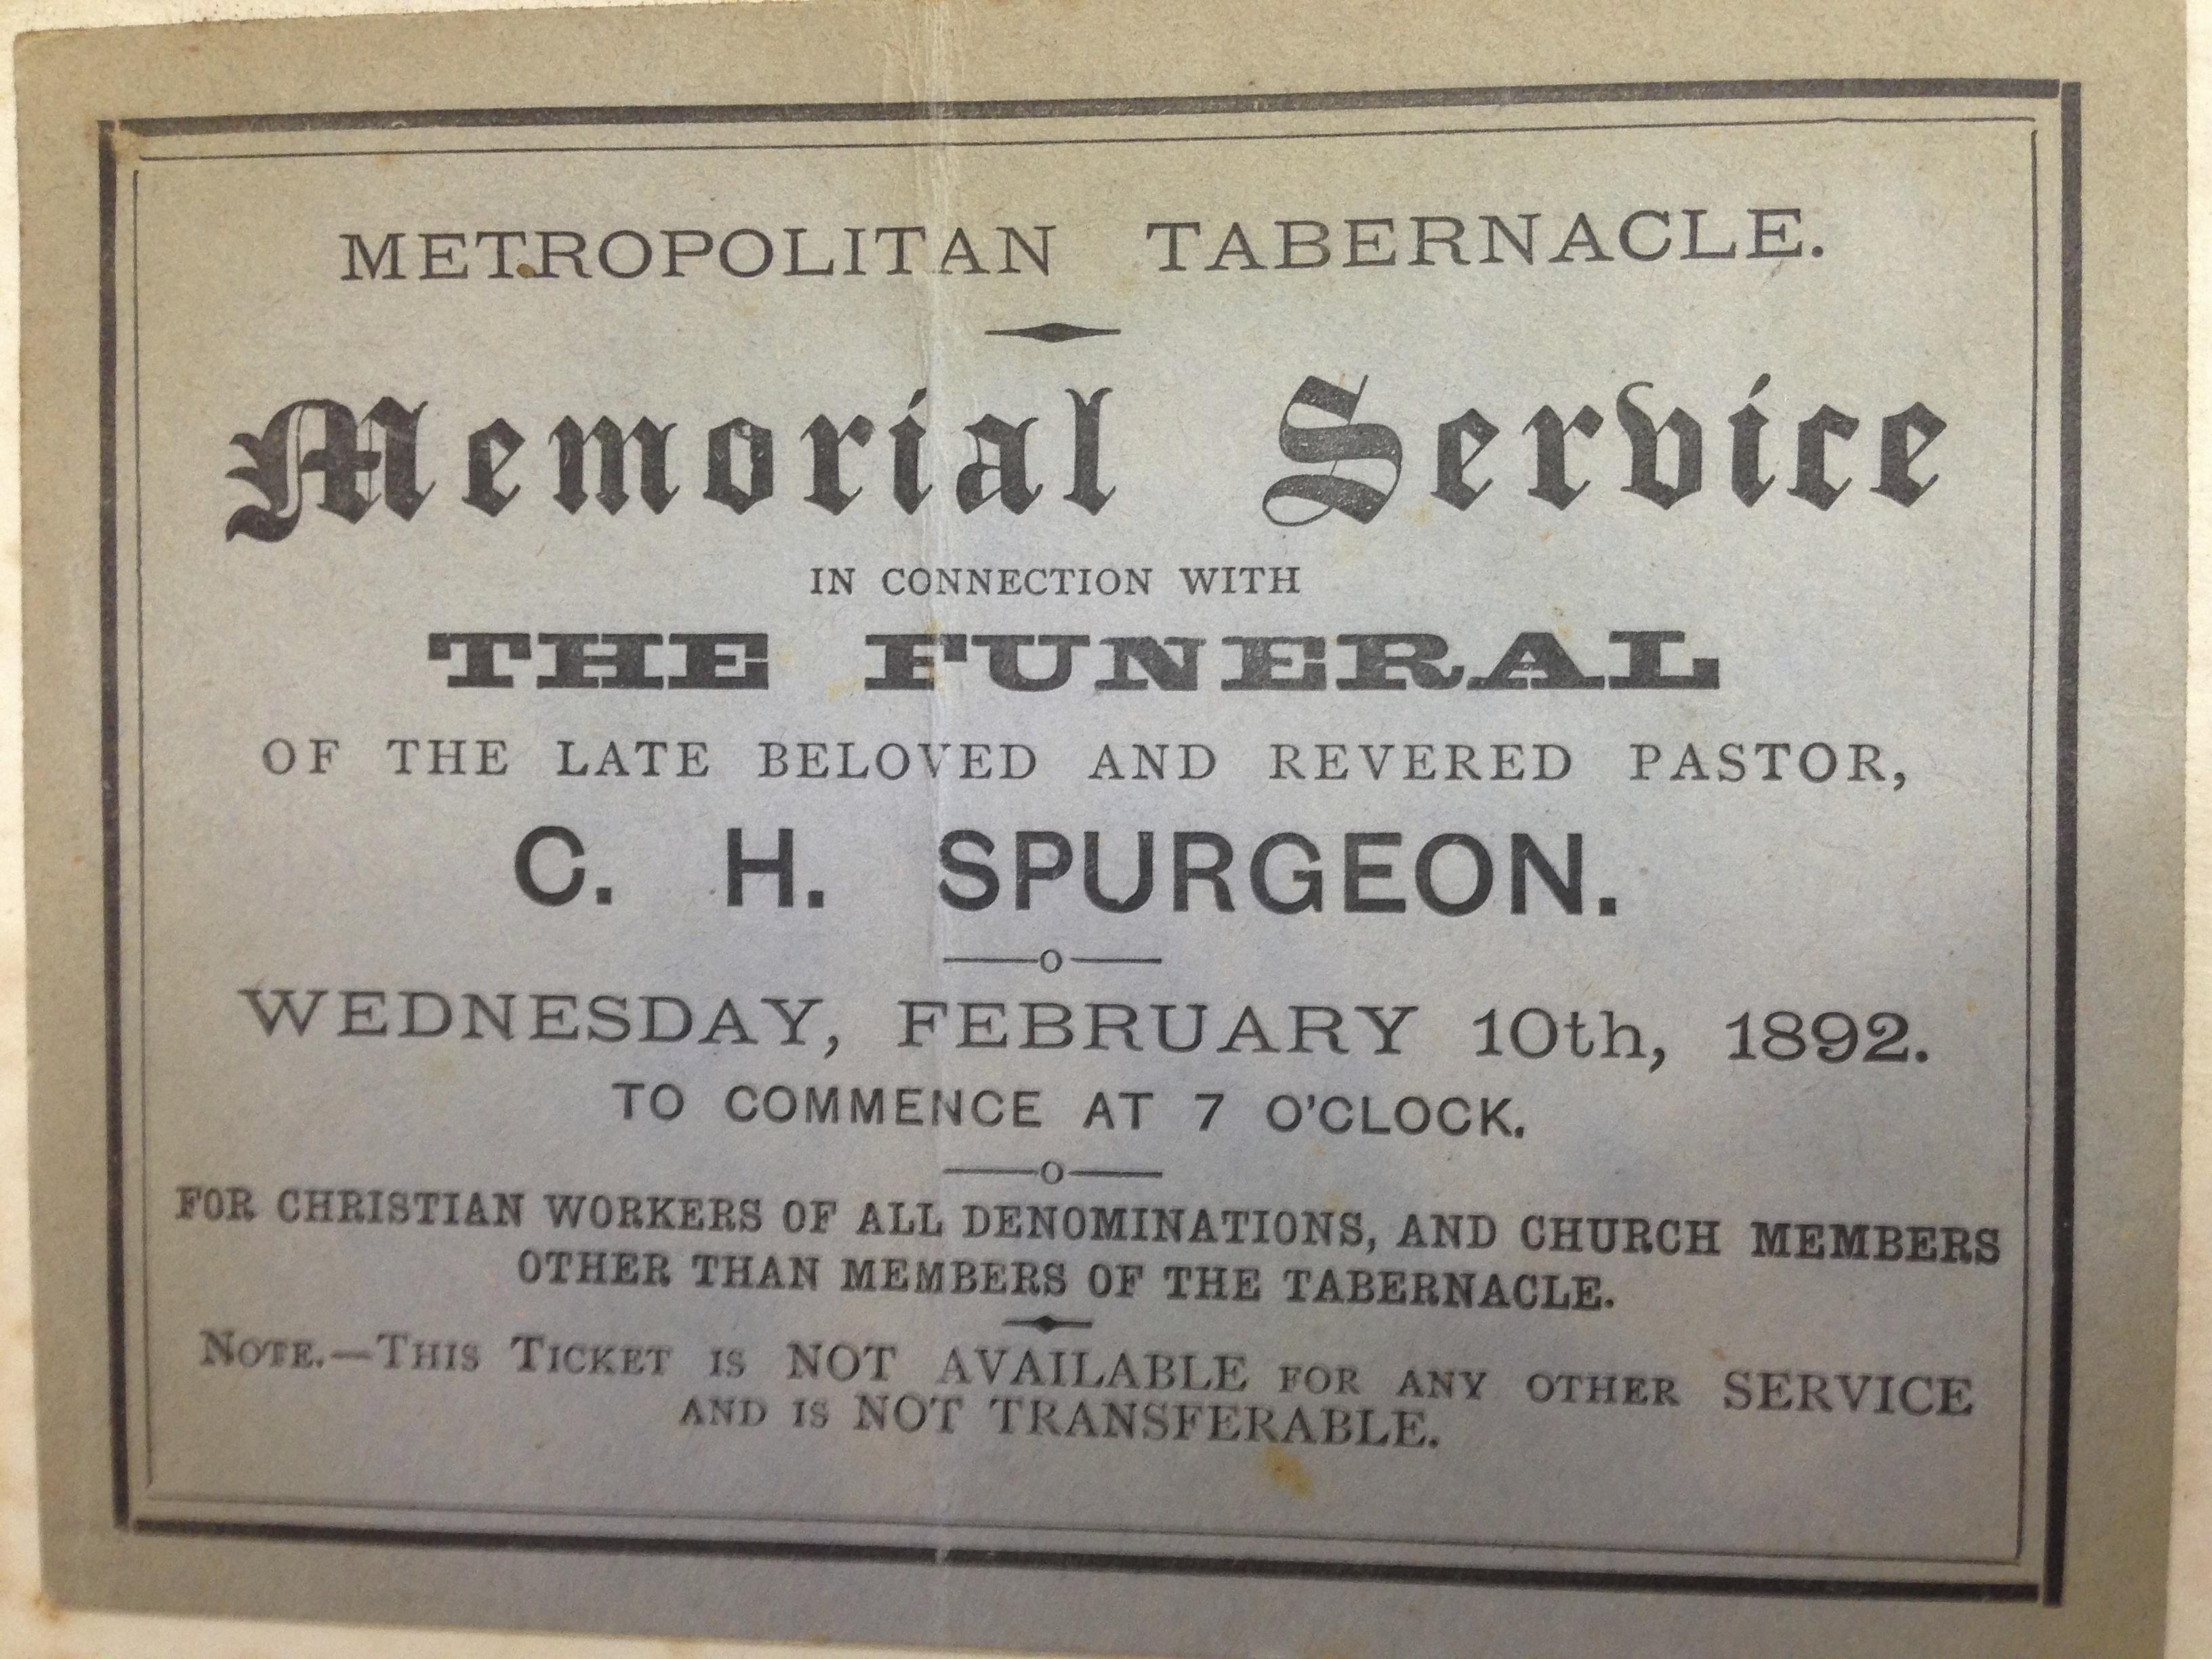 Charles Hadden Spurgeon's Funeral notice